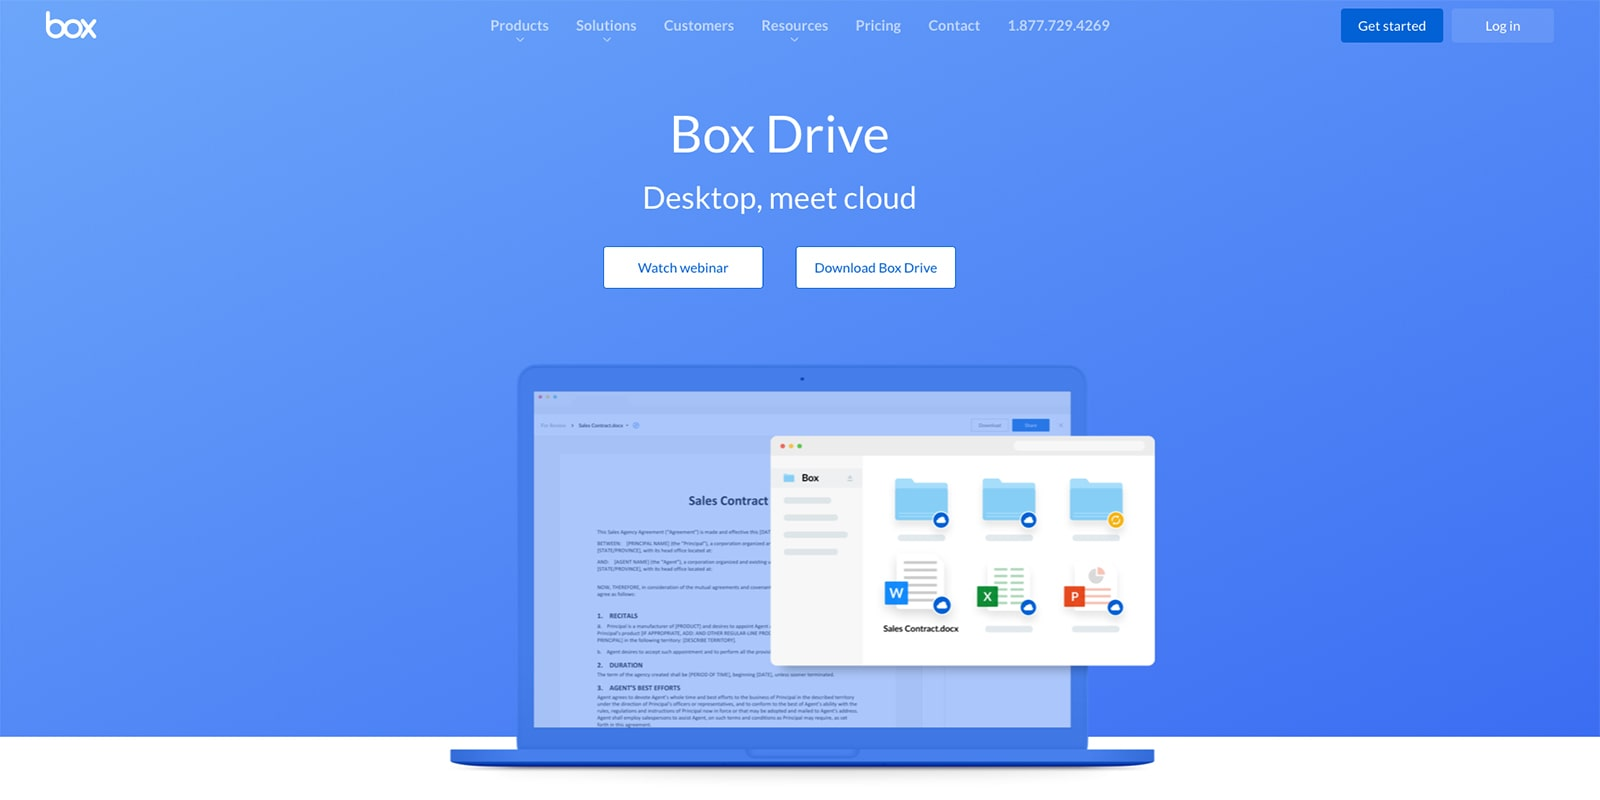 Box Drive